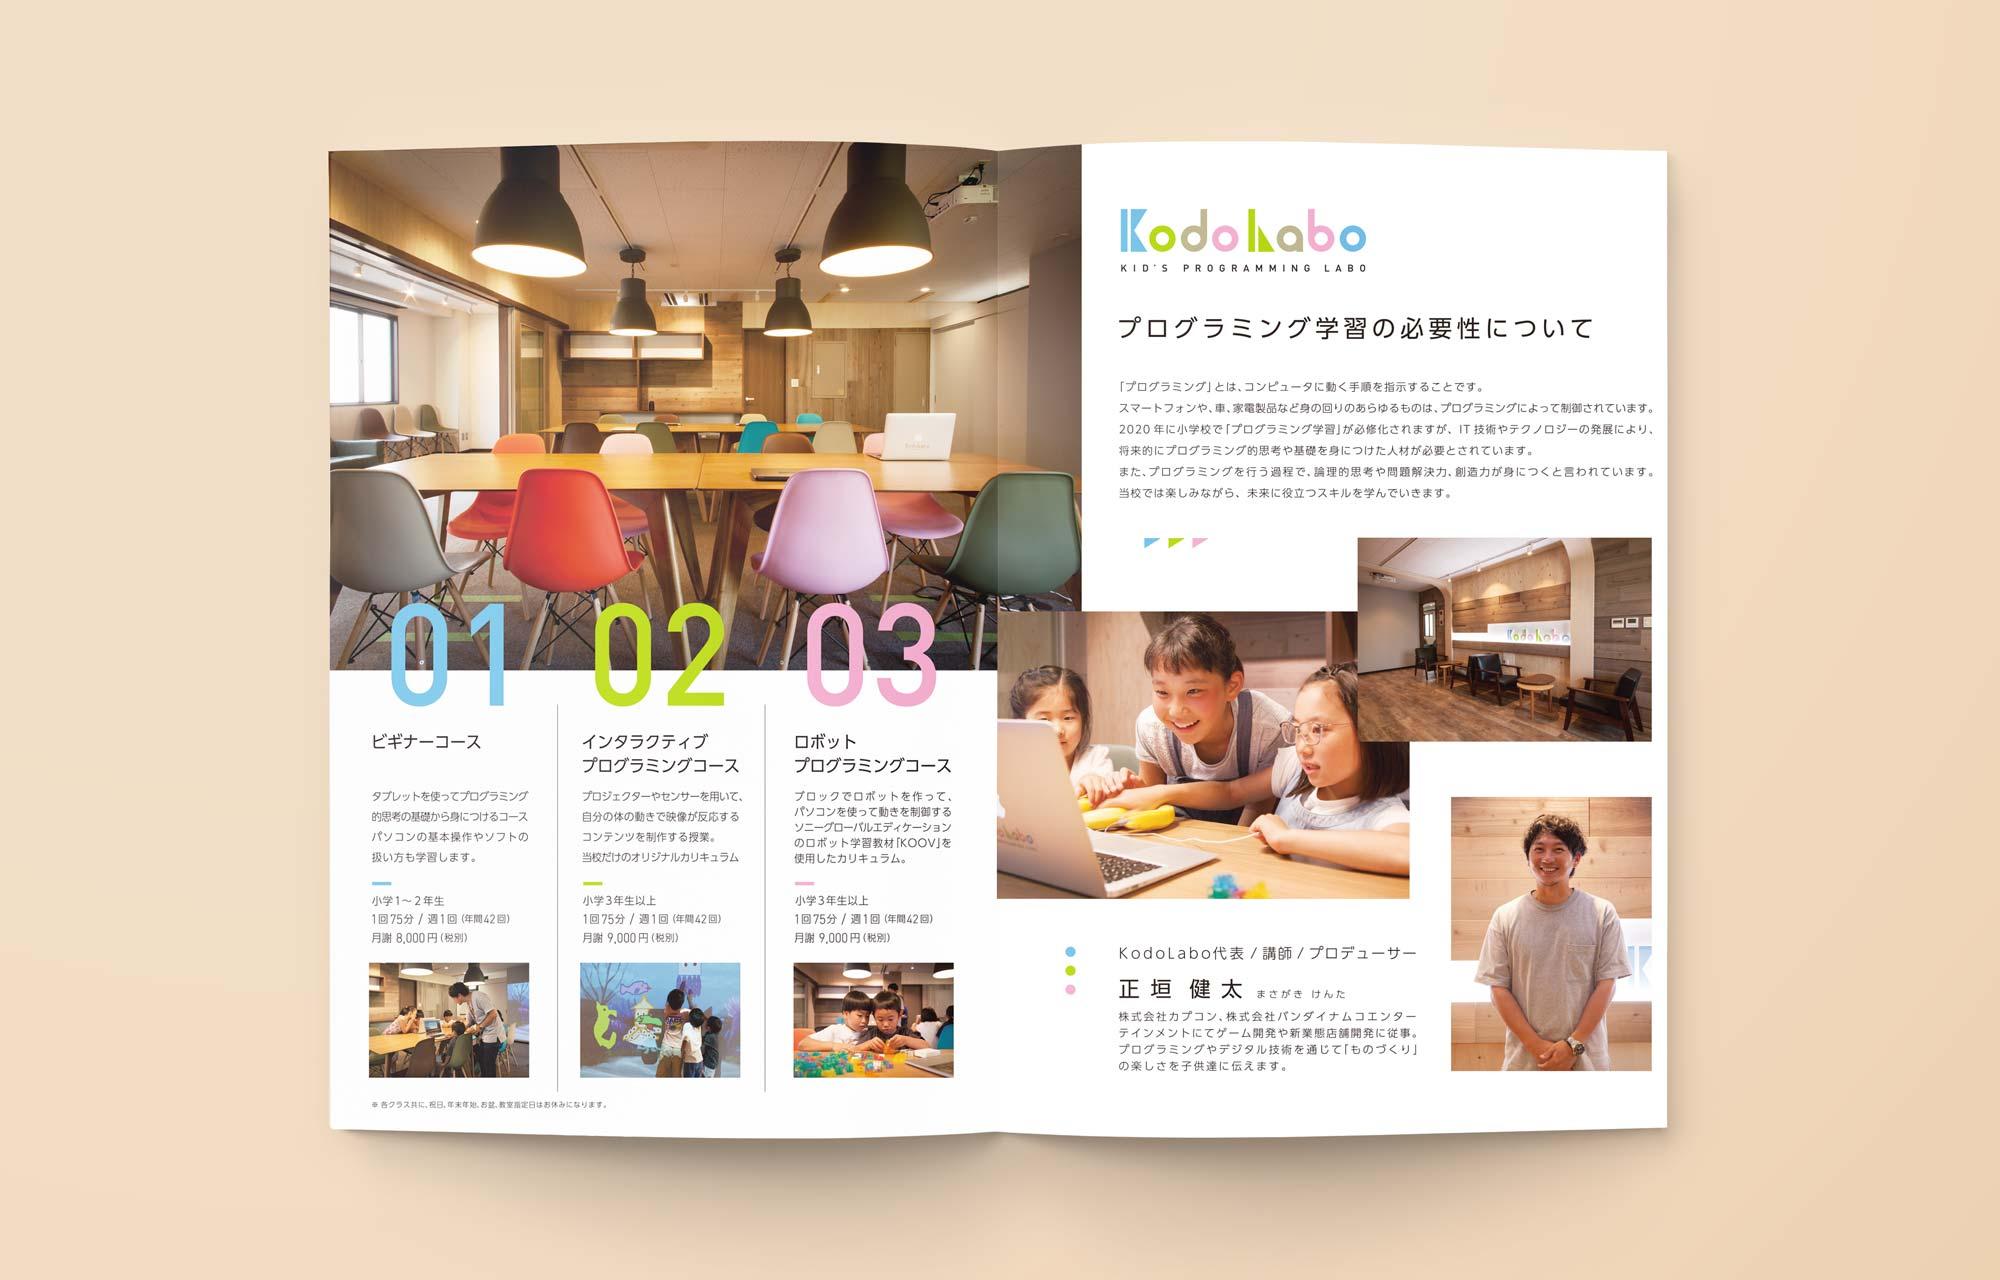 kodolabo様(町田)パンフレットデザイン/パンフレット制作